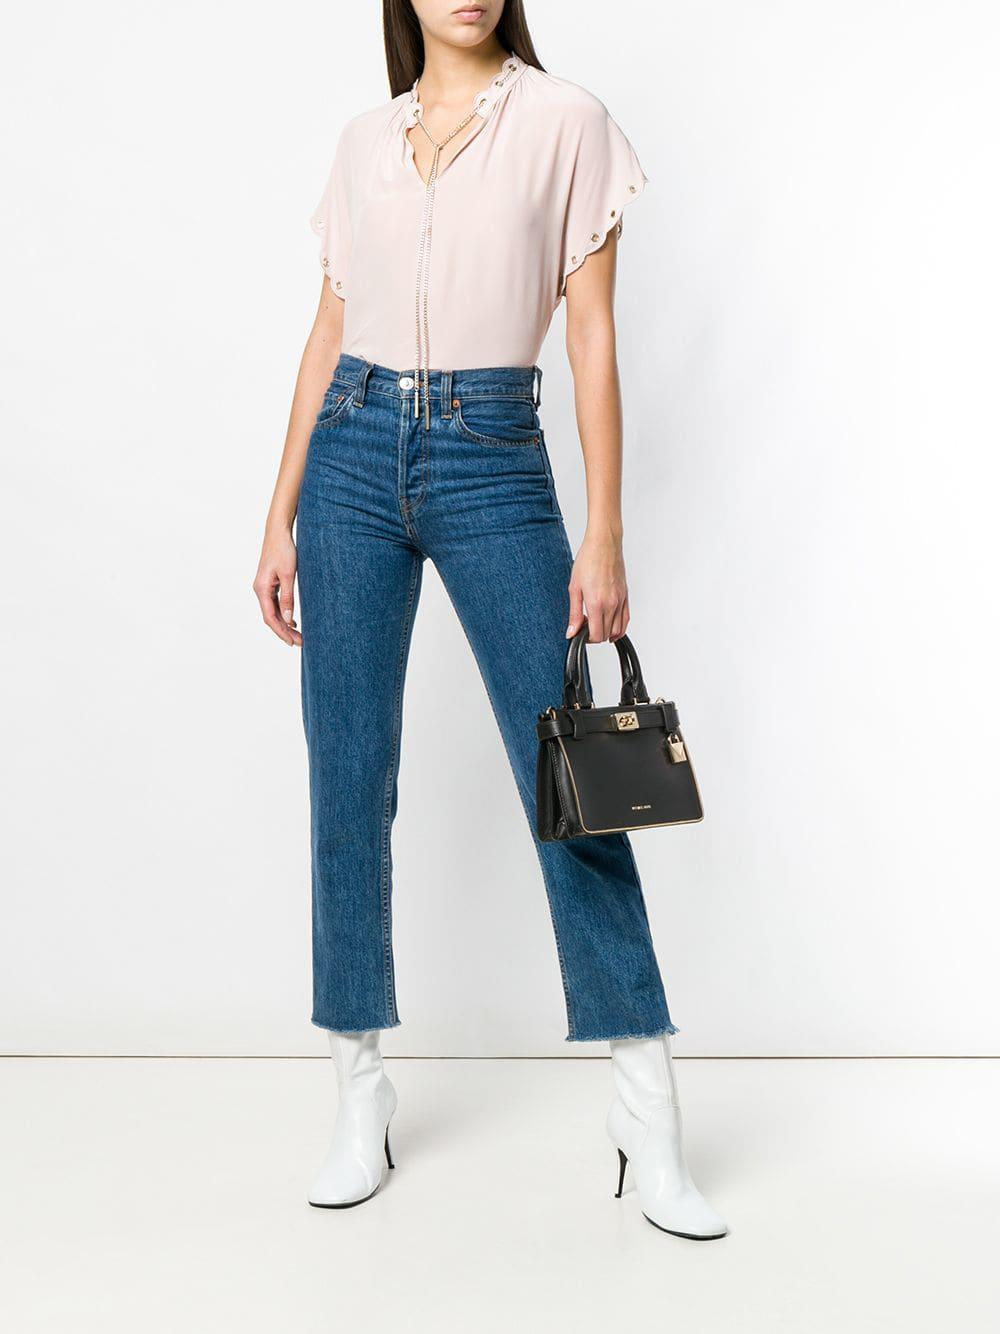 b5dc5ebd9746 MICHAEL Michael Kors Tatiana Leather Shoulder Bag in Black - Lyst